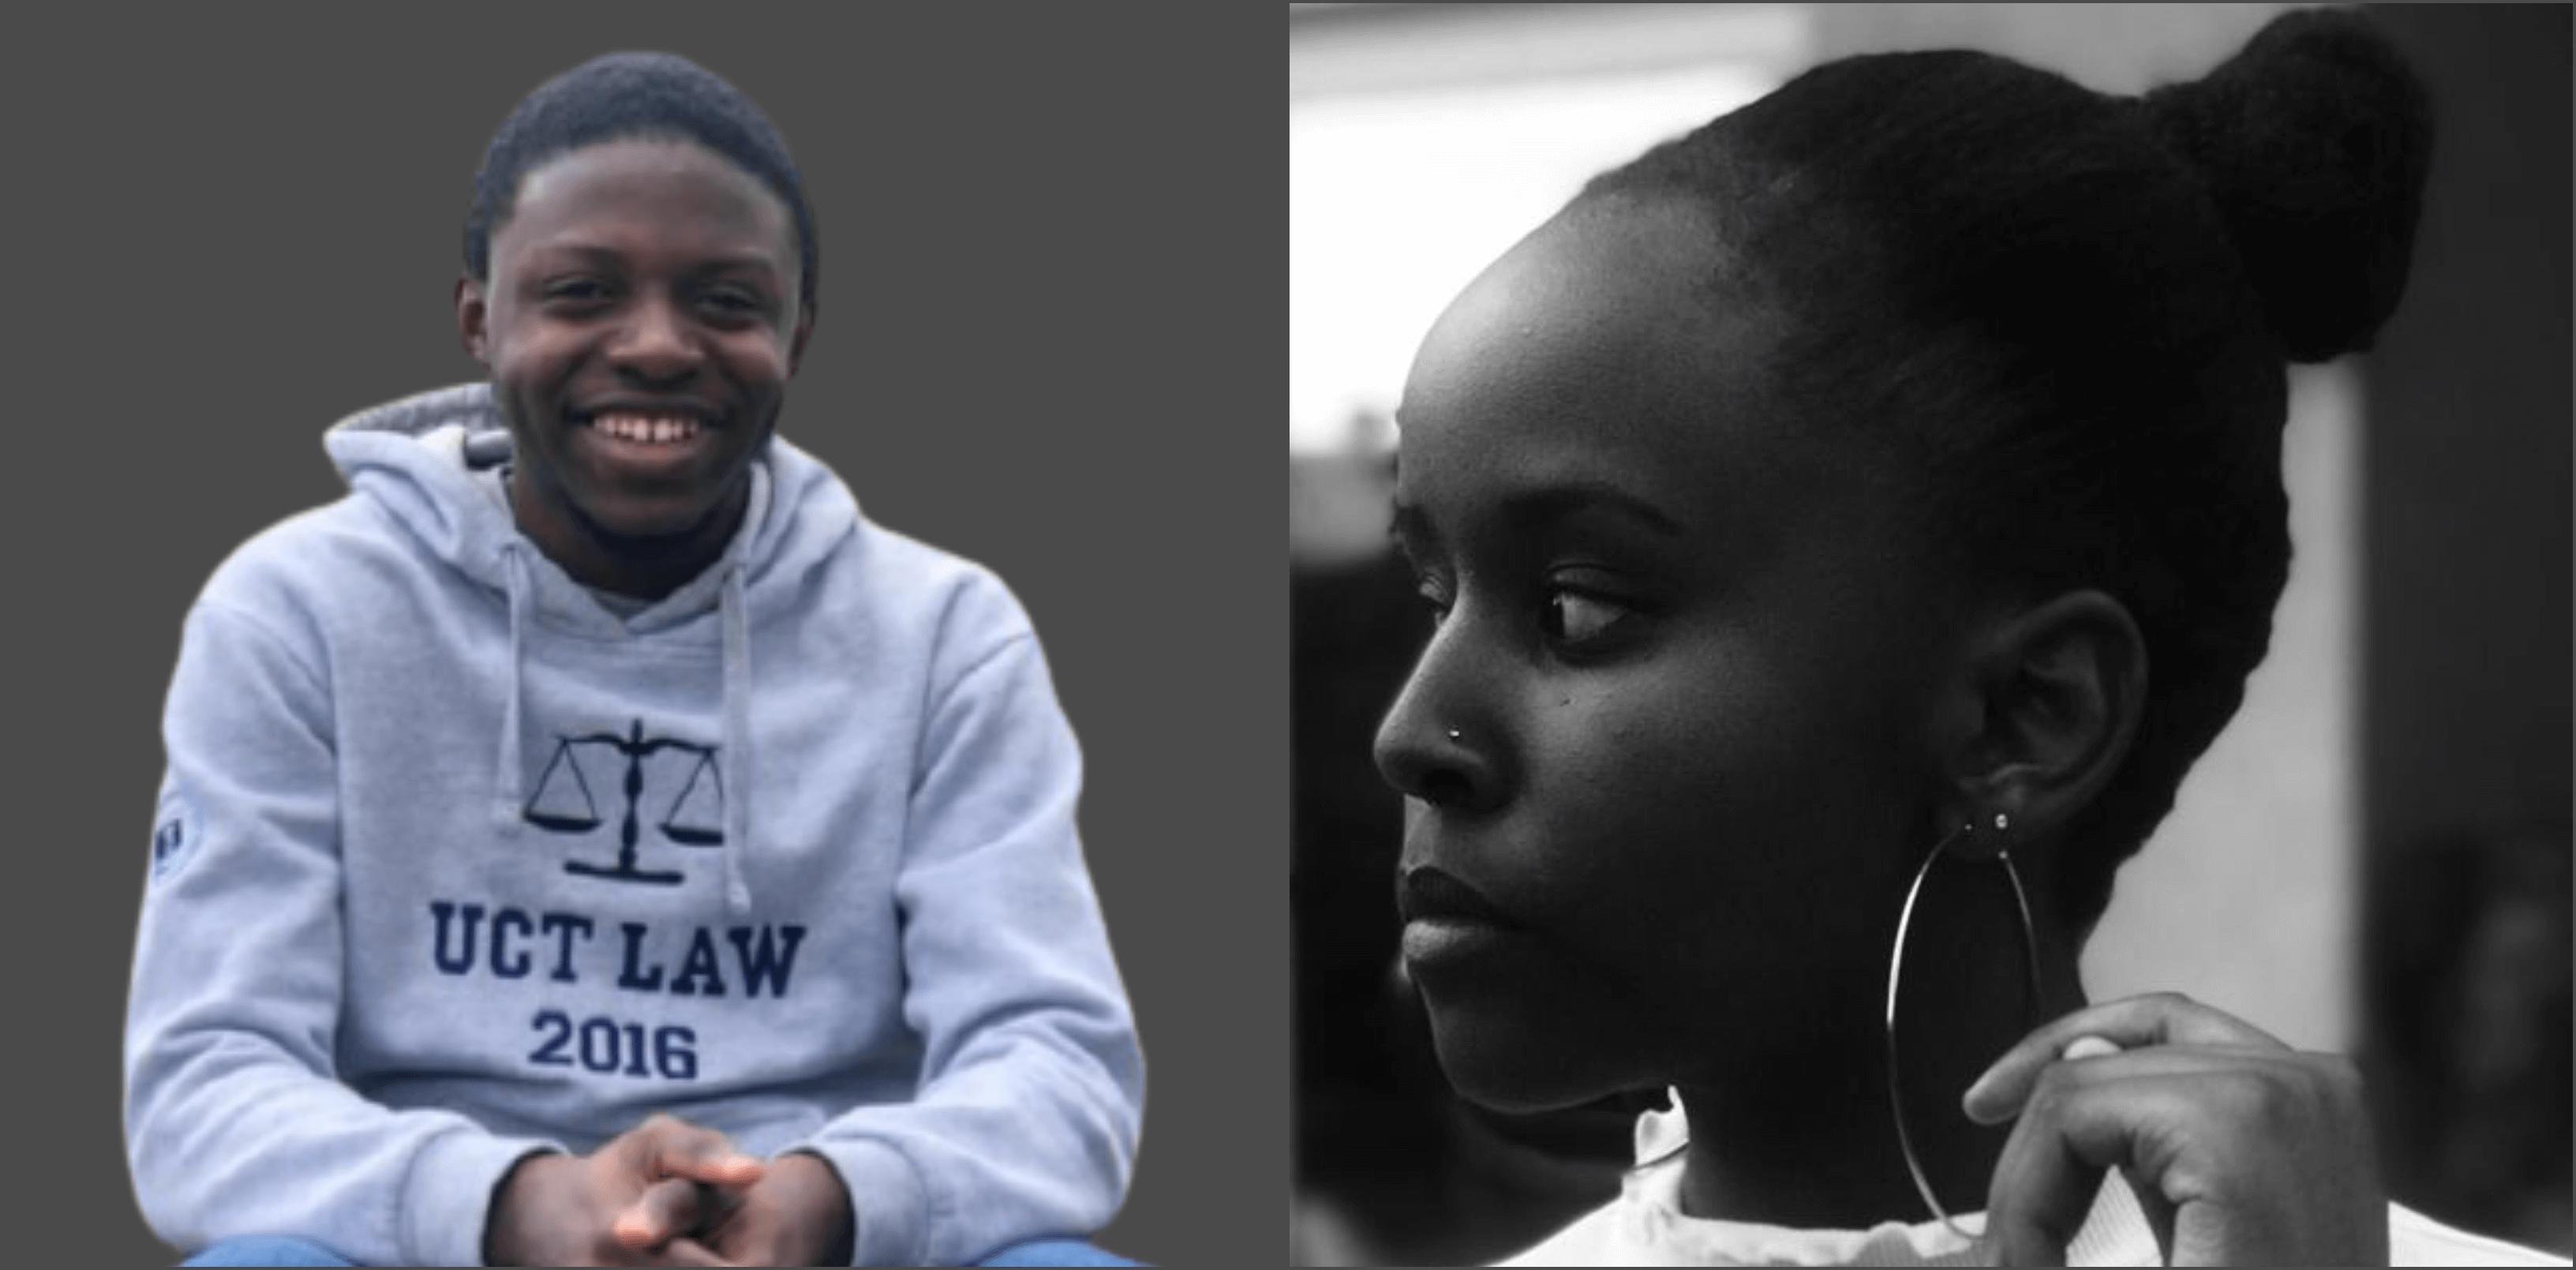 Ibukunoluwa Salau and Angela Kagabo, Co-founders of Afriktrips